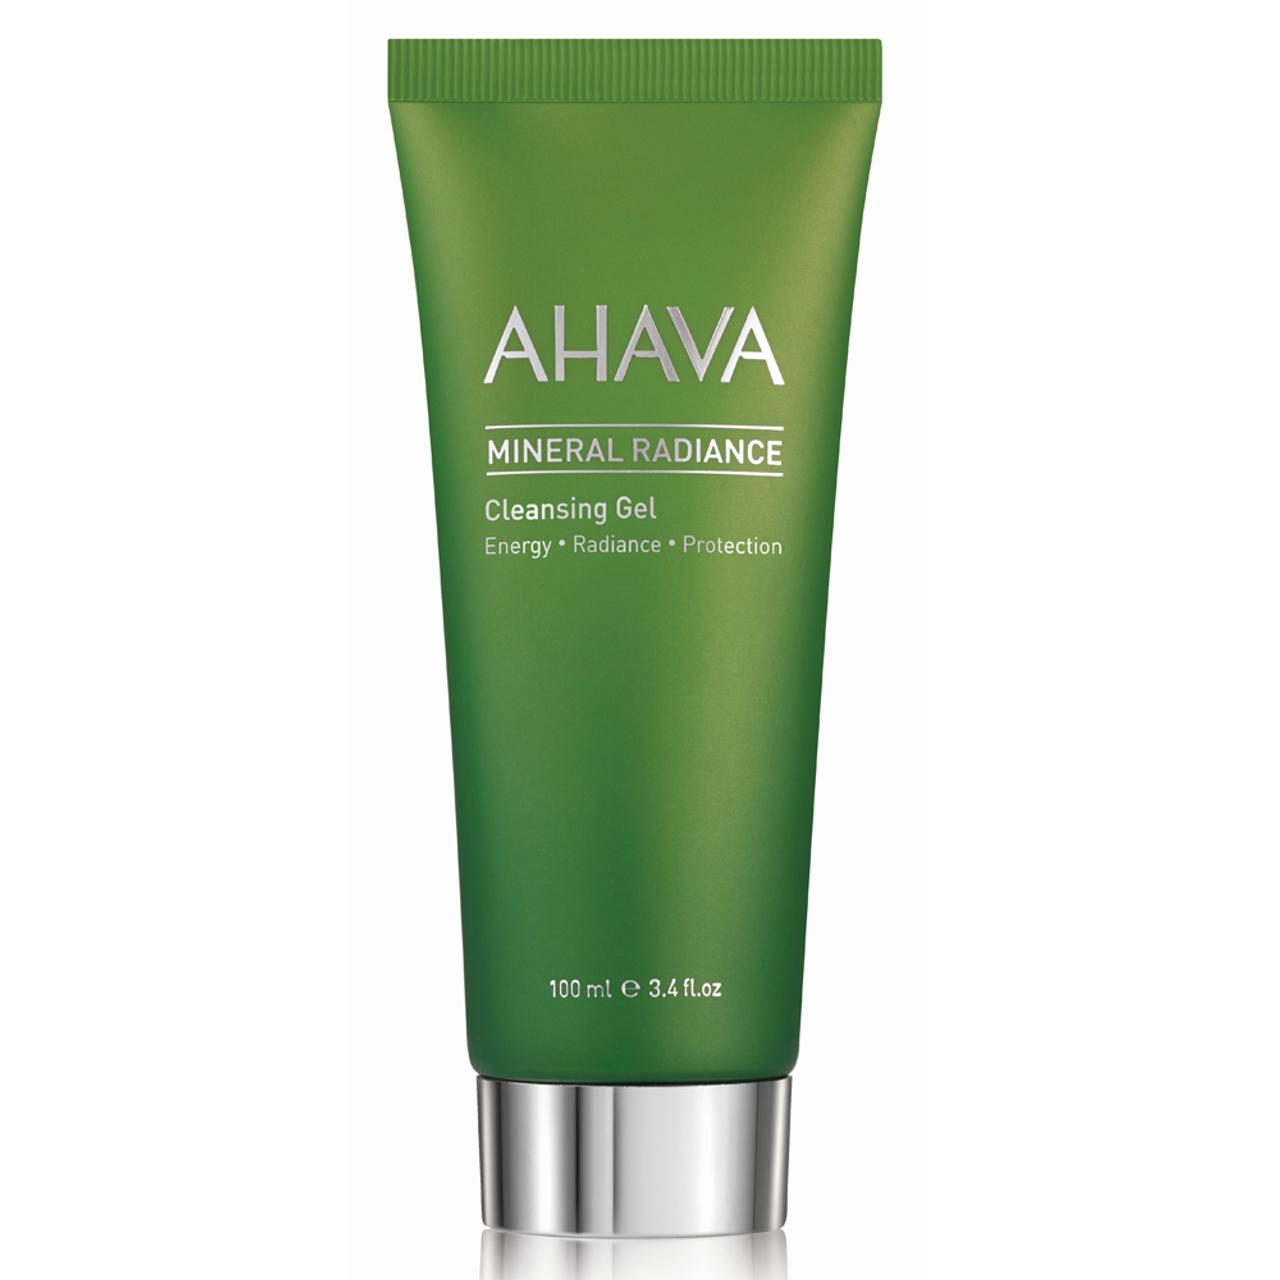 AHAVA Mineral Radiance Cleansing Gel BeautifiedYou.com